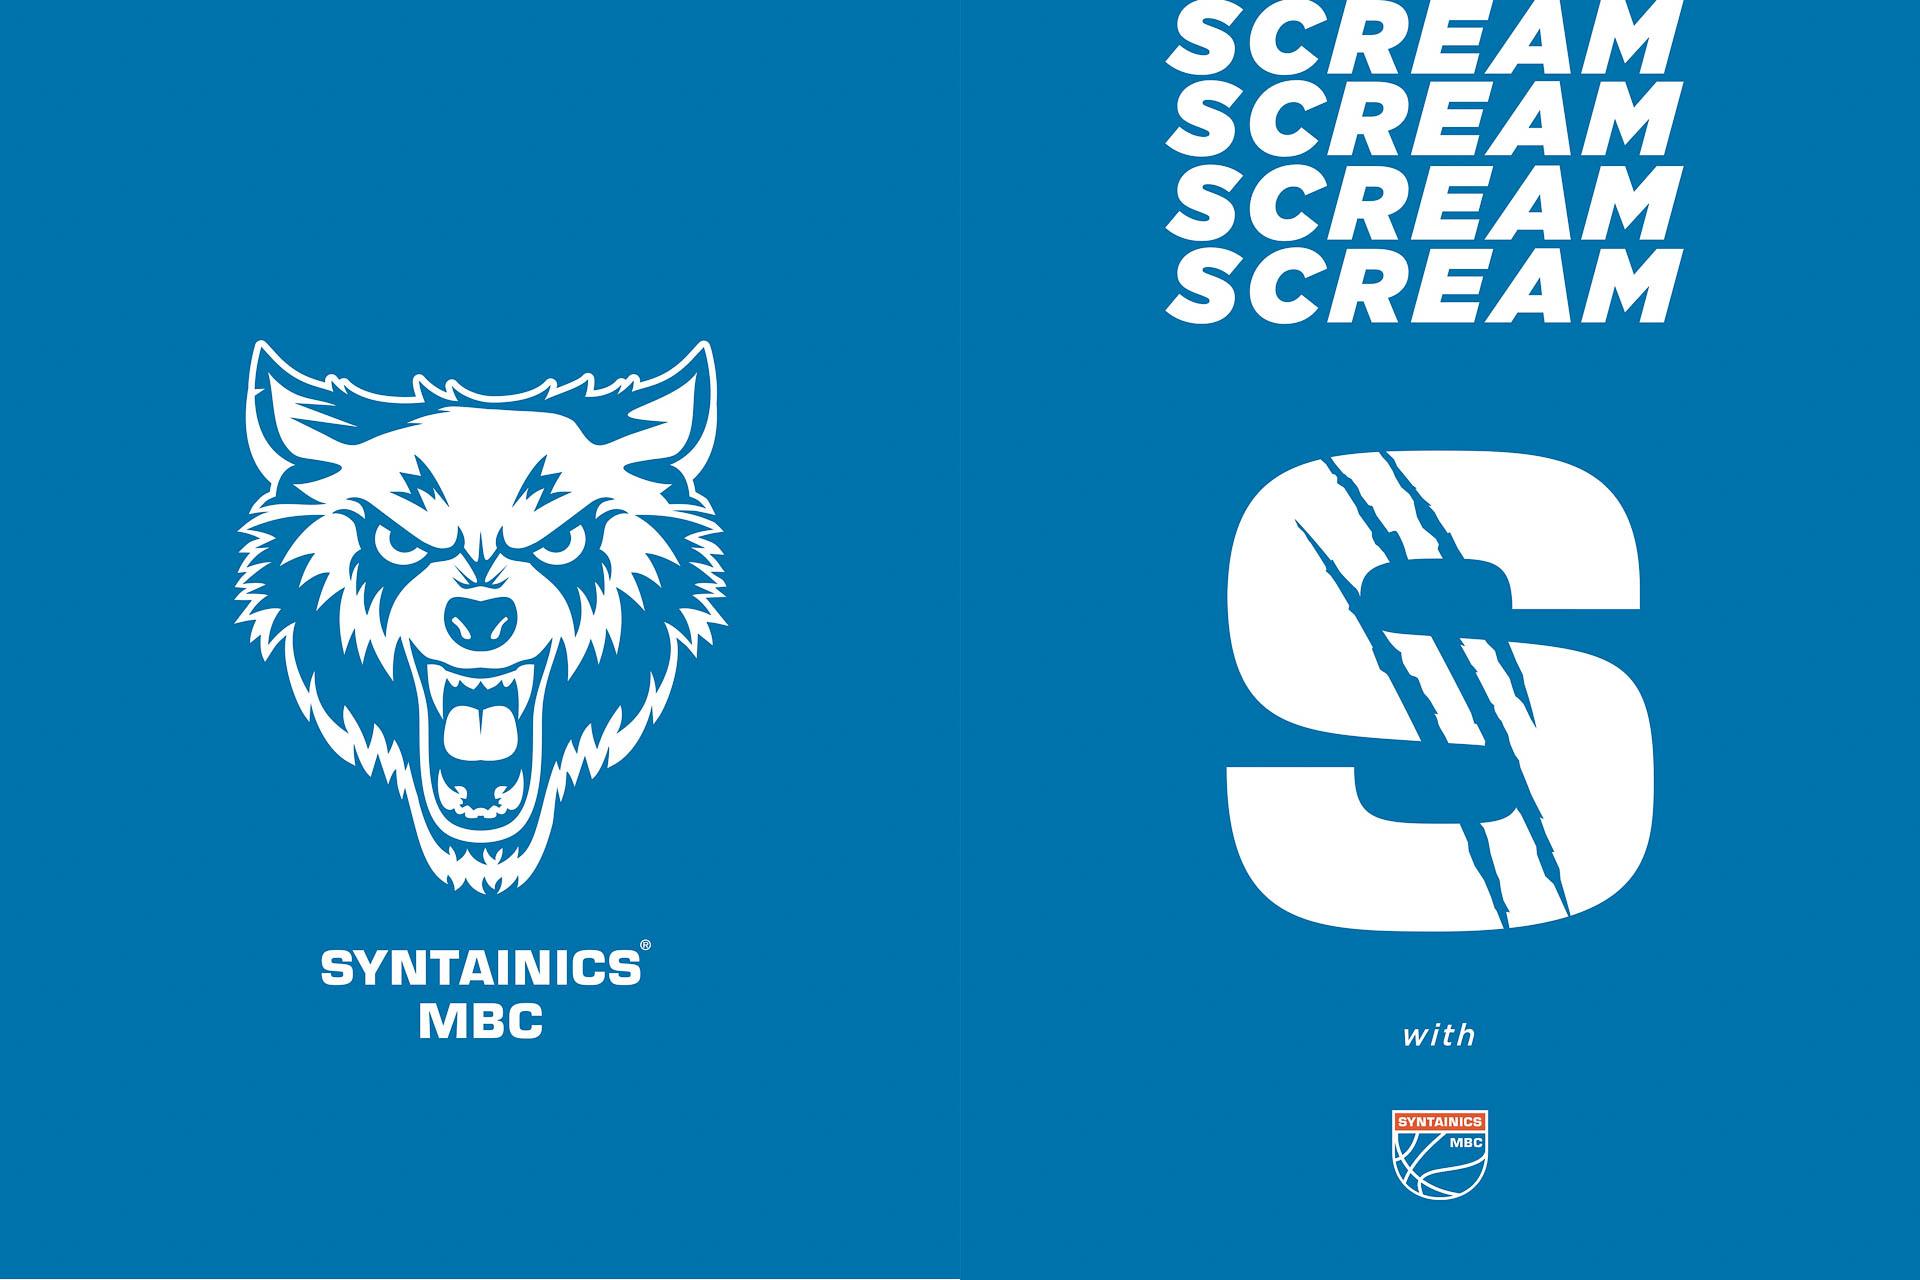 BECKER-CREATIVE-SYNTAINICS-MBC_009.jpg